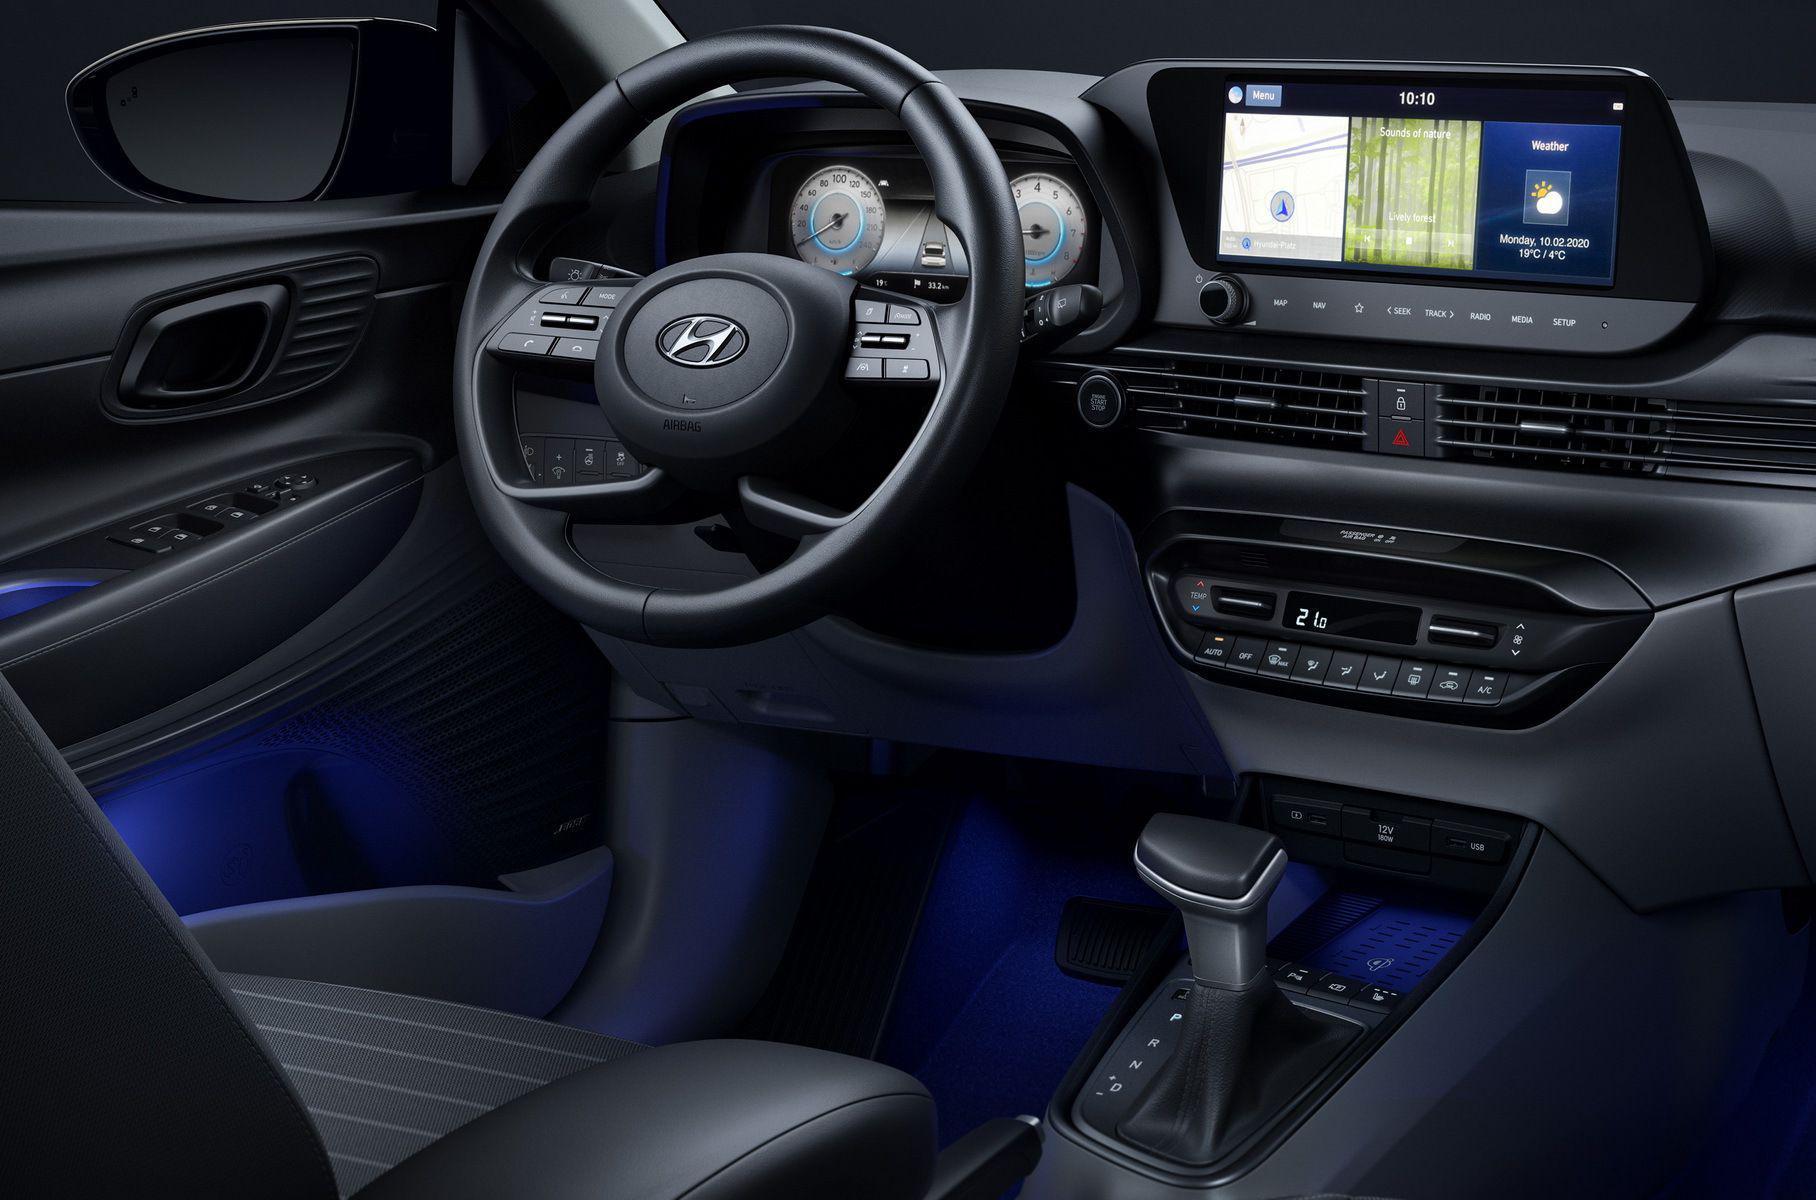 Новый Hyundai i20 показал салон